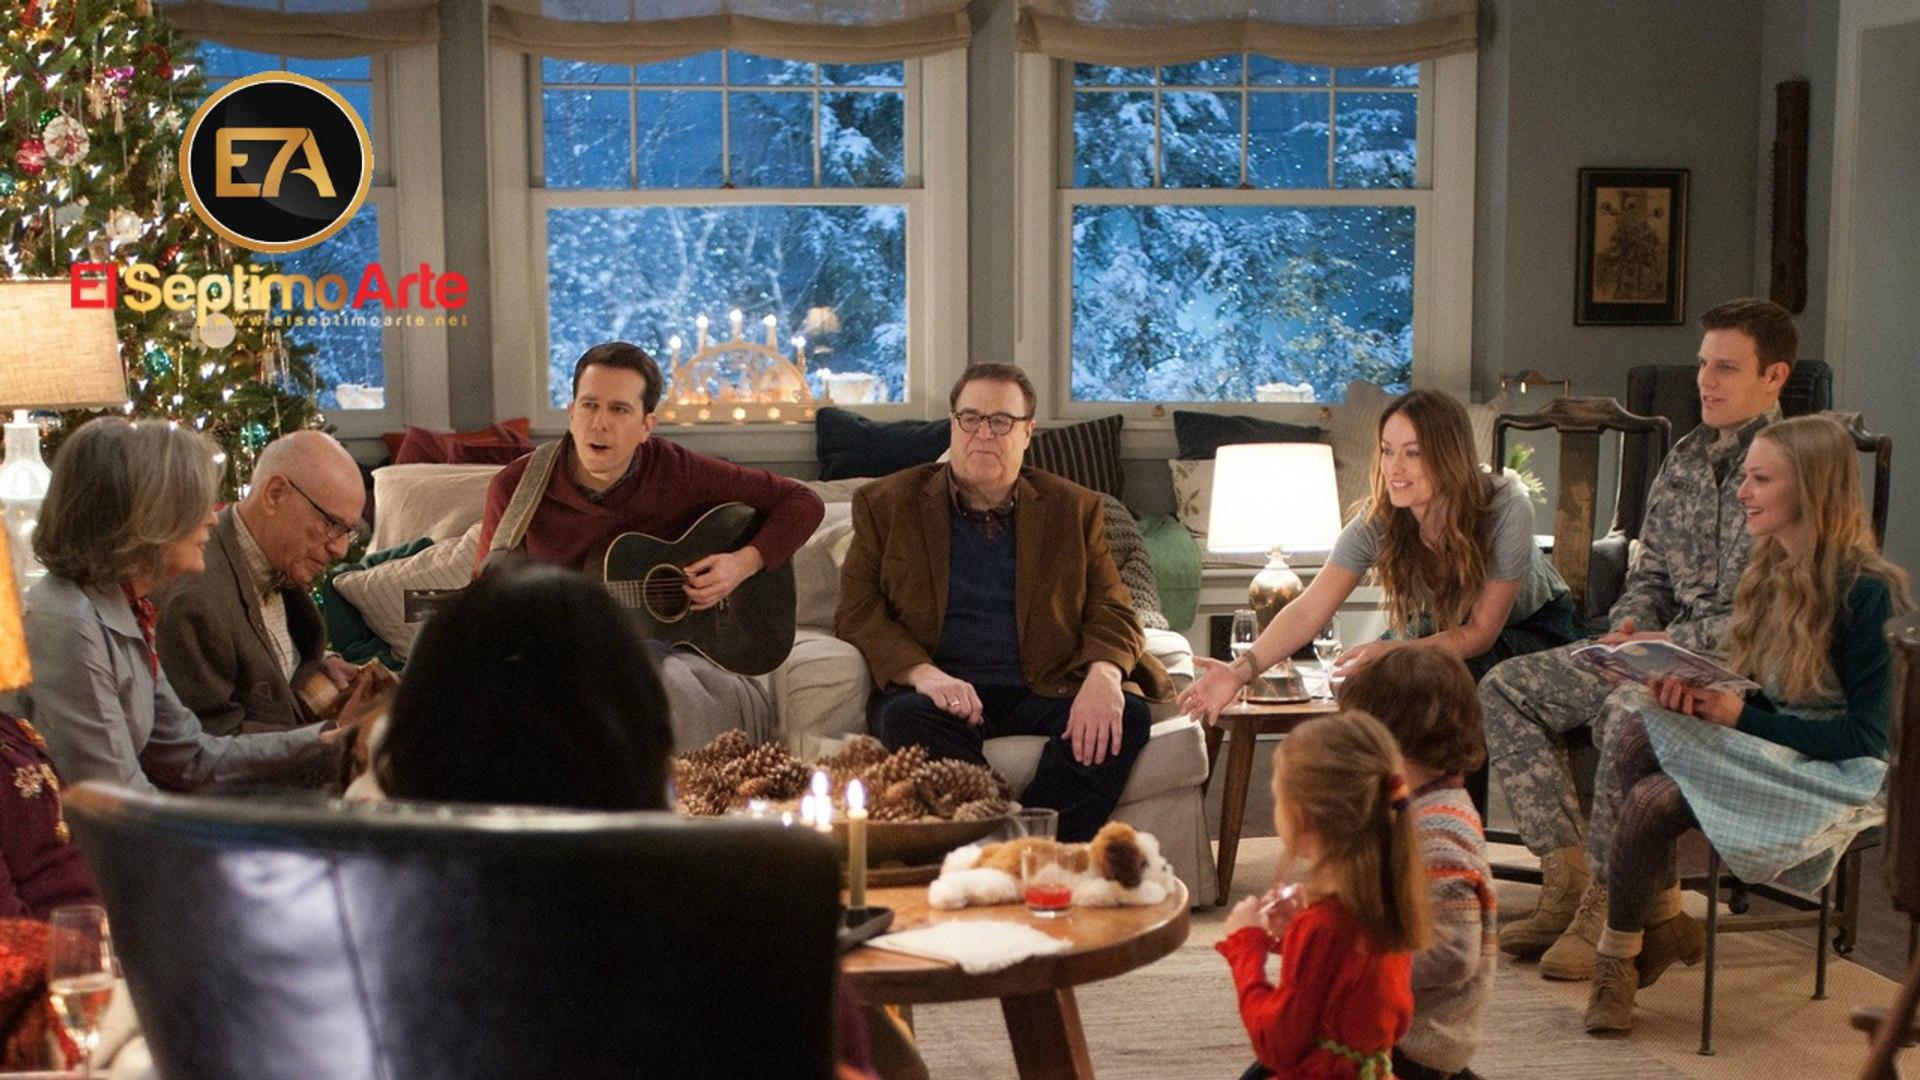 'Navidades, ¿bien o en familia?' - Tráiler español (HD)